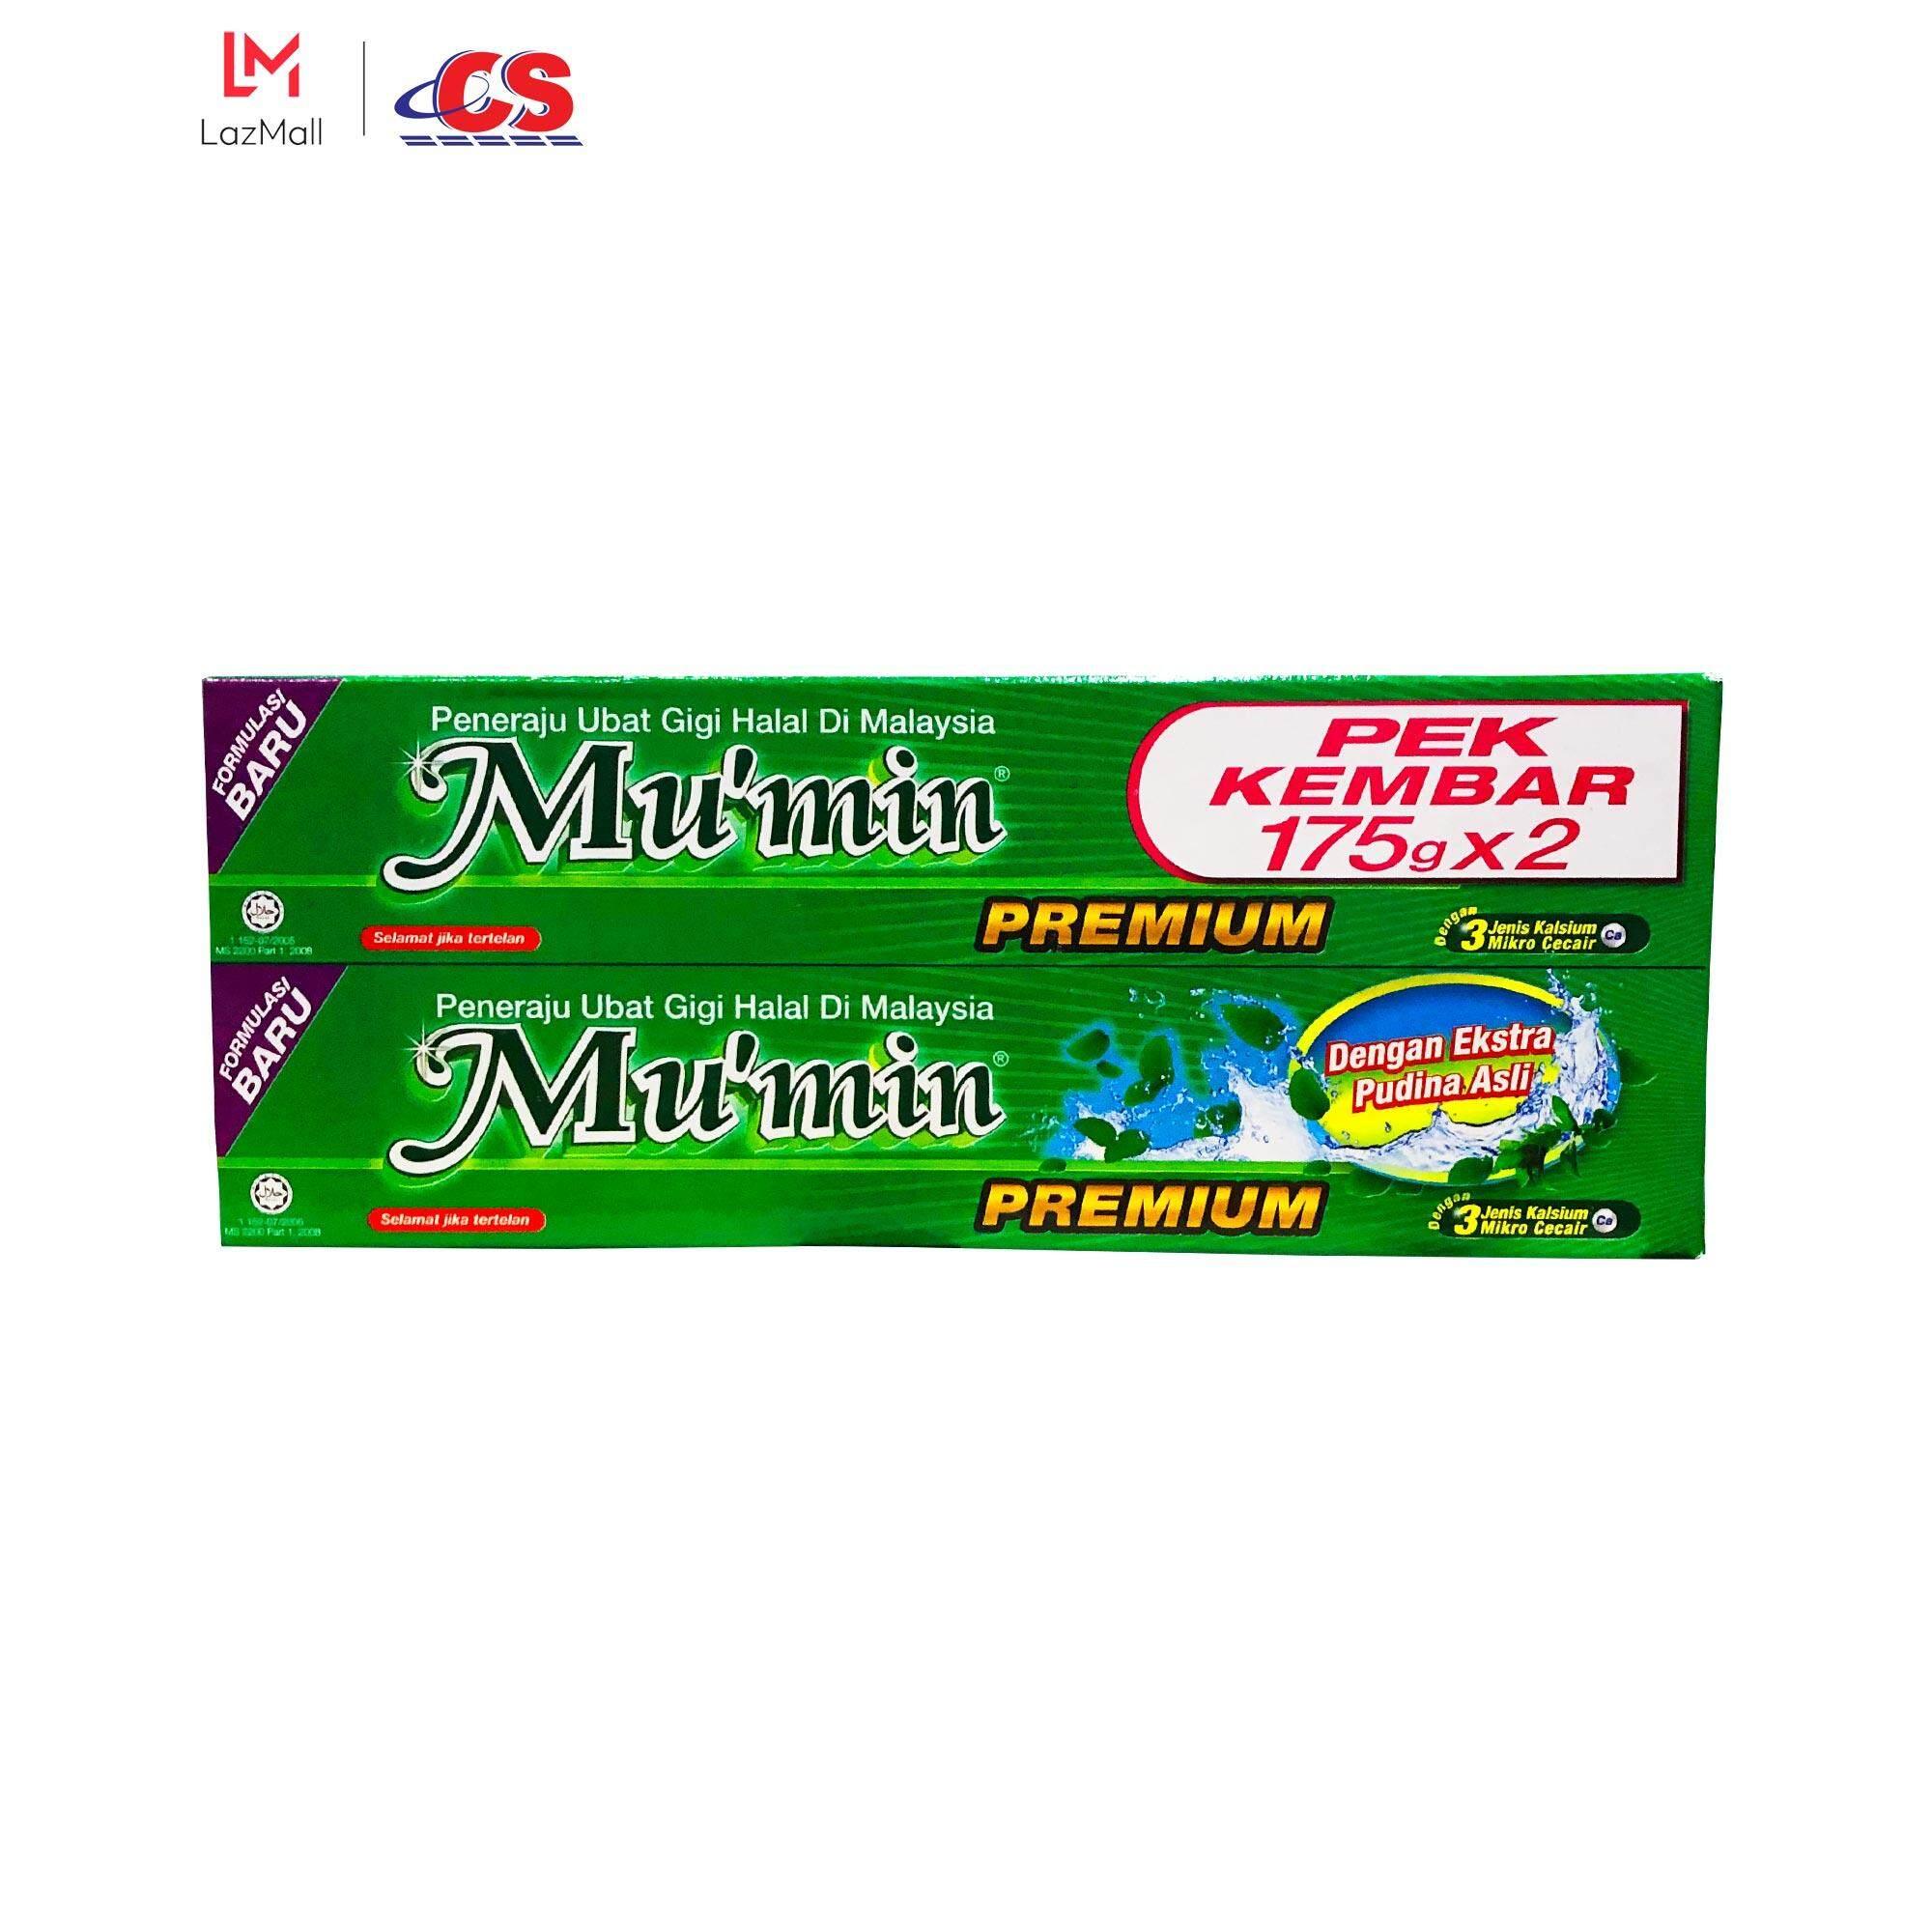 MU'MIN Toothpaste Pudina Twin Pack (2s x 175g)